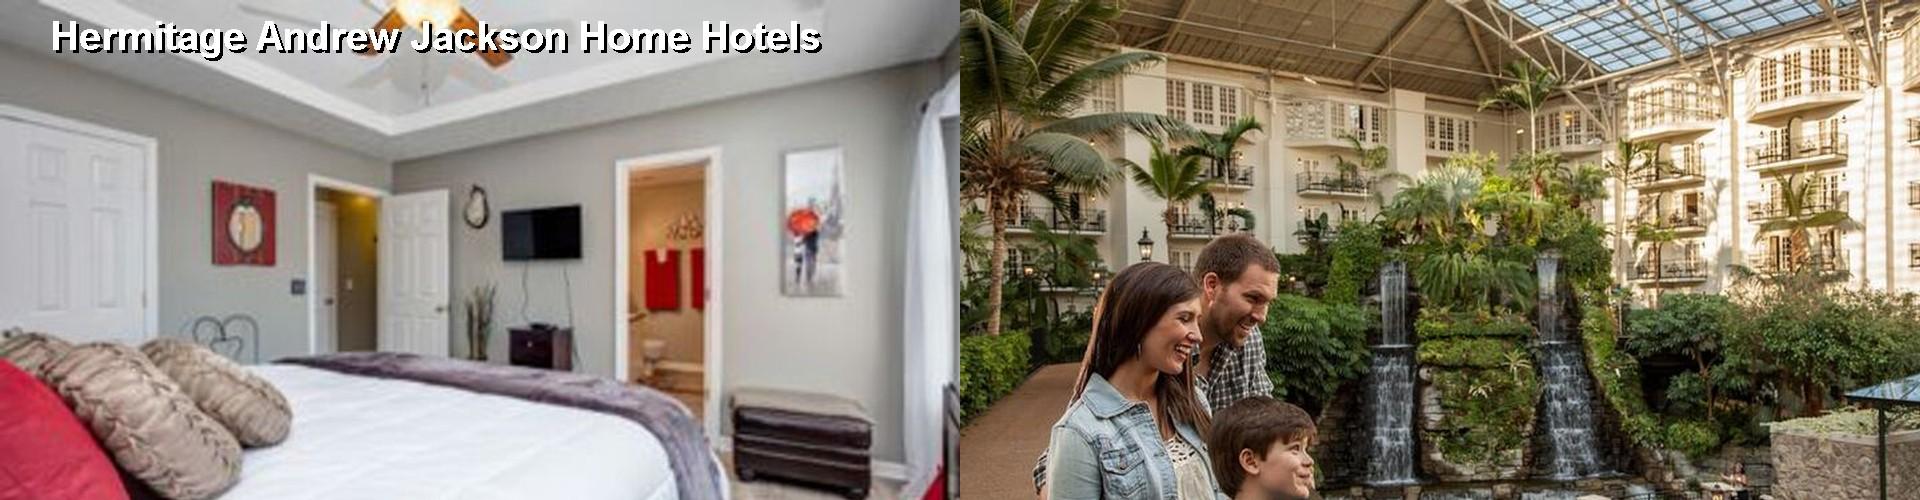 Cheap Hotels Near Franklin Tn